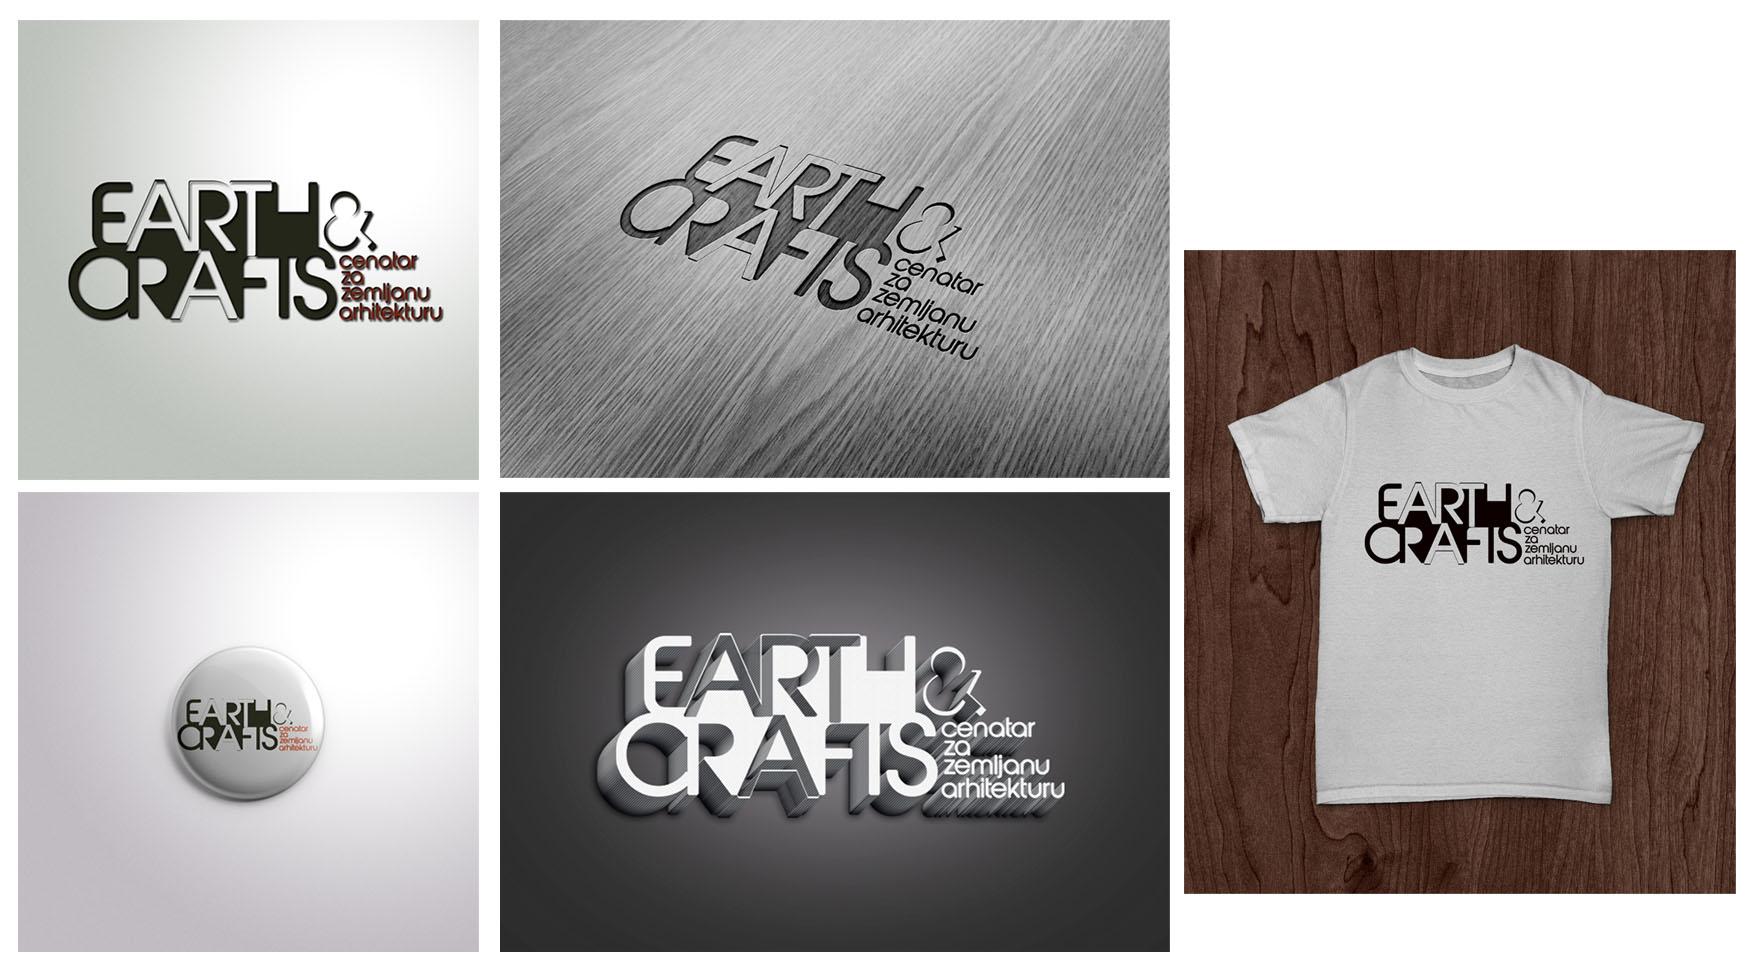 17 predlog logo EARTH&CRAFTS nevena kekic nevena.kekic@gmail.com